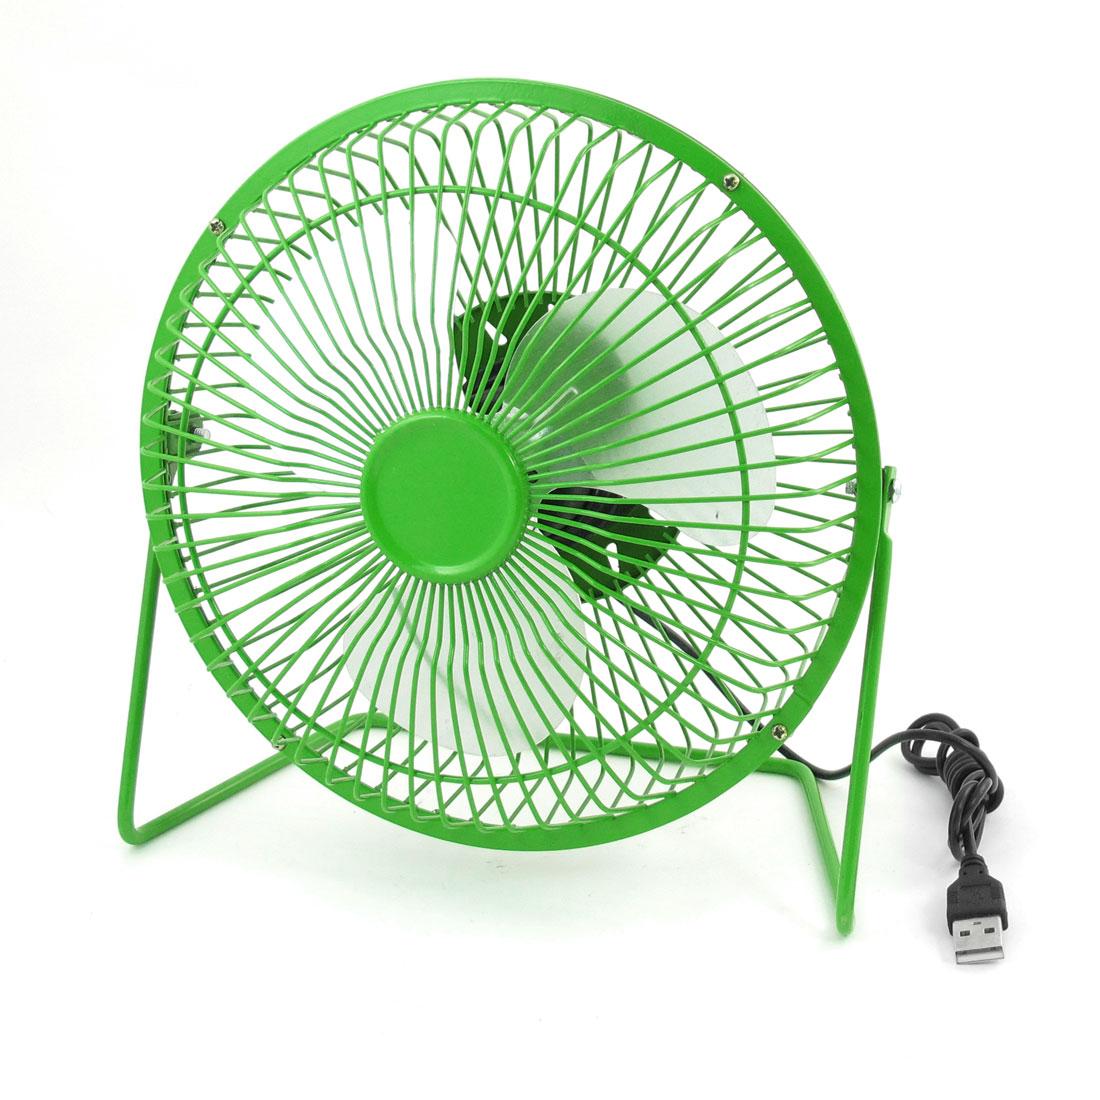 Adjustable Angle USB Connector Cooler Cooling Desk Mini Fan Green